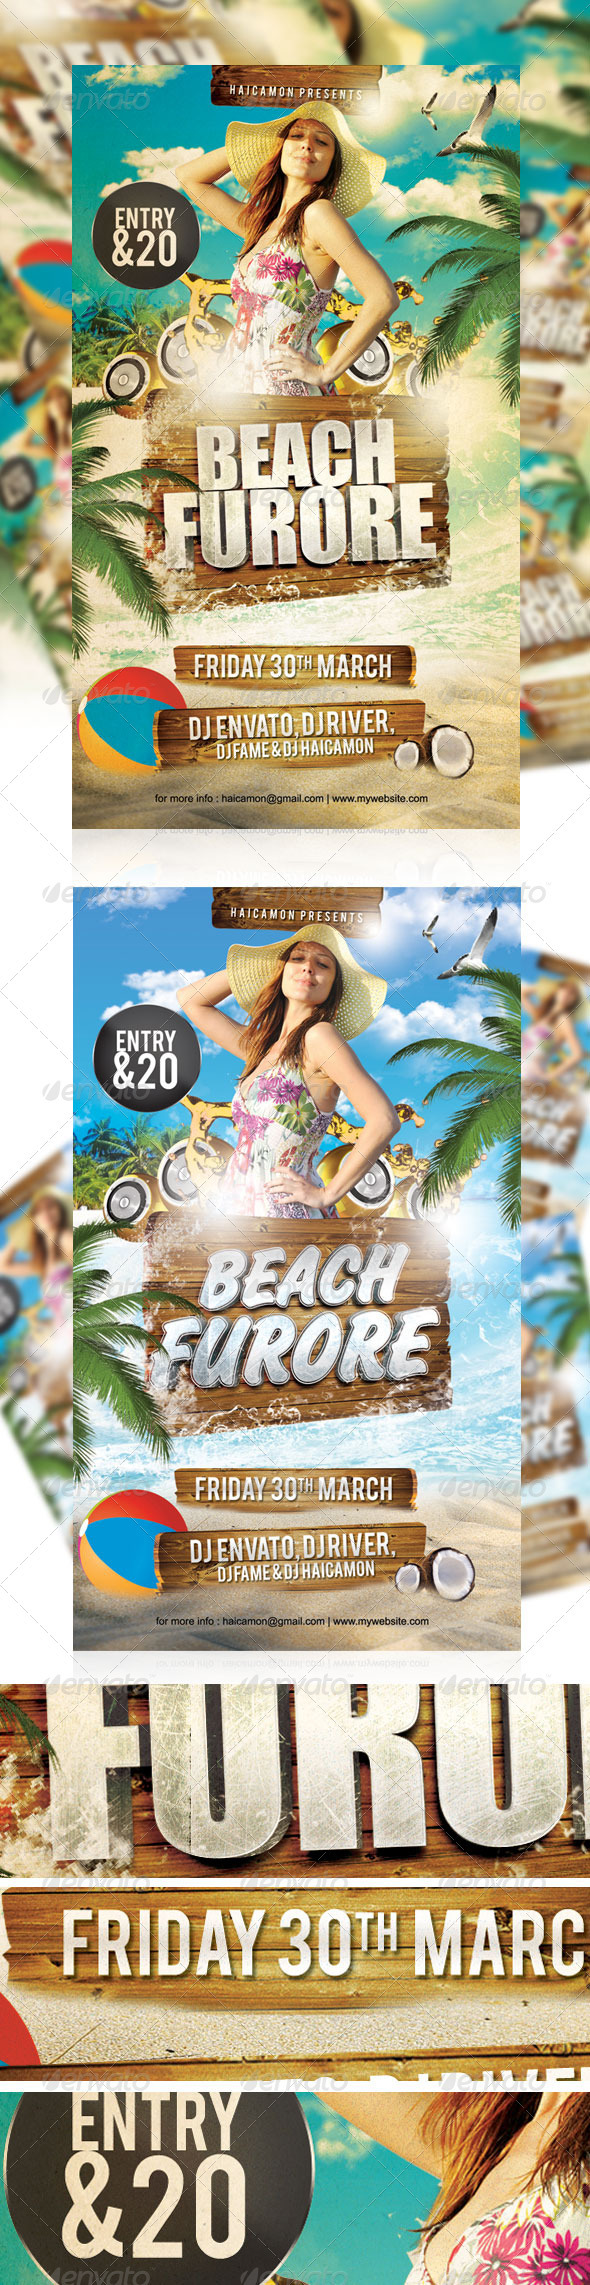 GraphicRiver Beach Furore Party Flyer 1937329